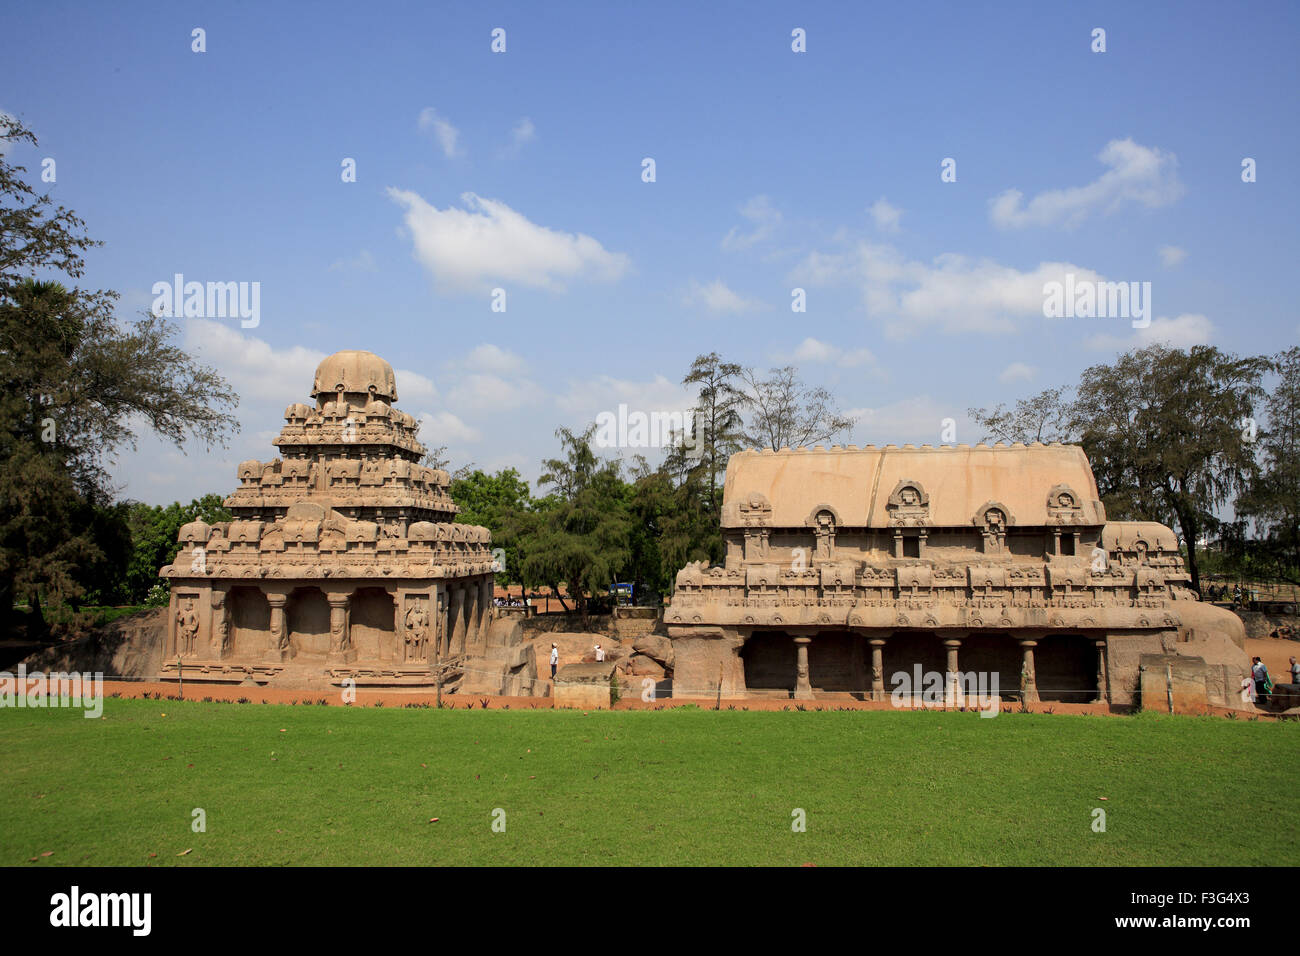 Pancha Rathas right Bhima Ratha left Dharmaraja Ratha carvedKing Mamalla temples ; Mahalipuram - Stock Image